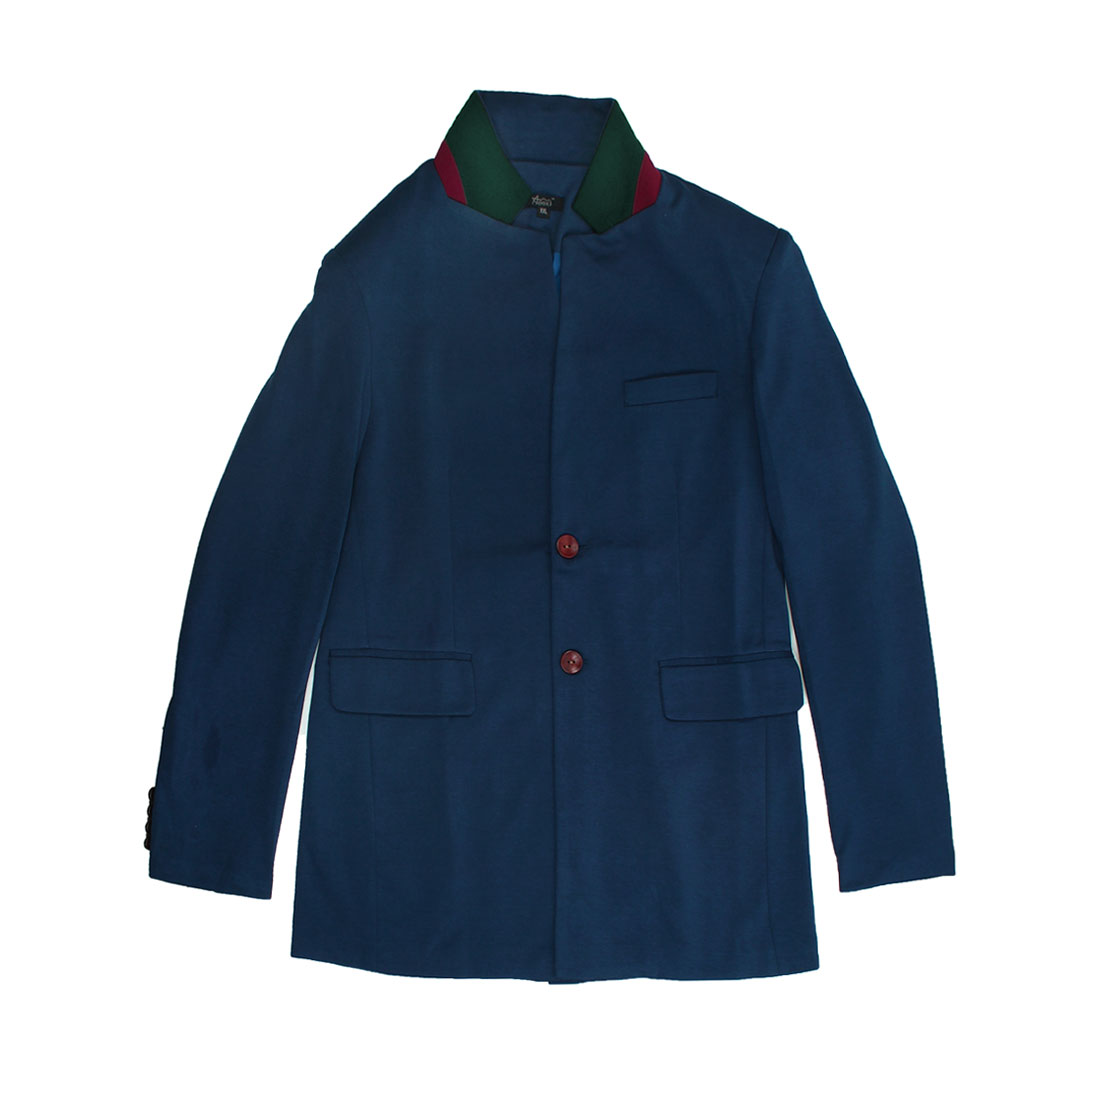 Blue M Flap Pockets Breast Pocket Skinny Fit Style Fashion Men Blazer